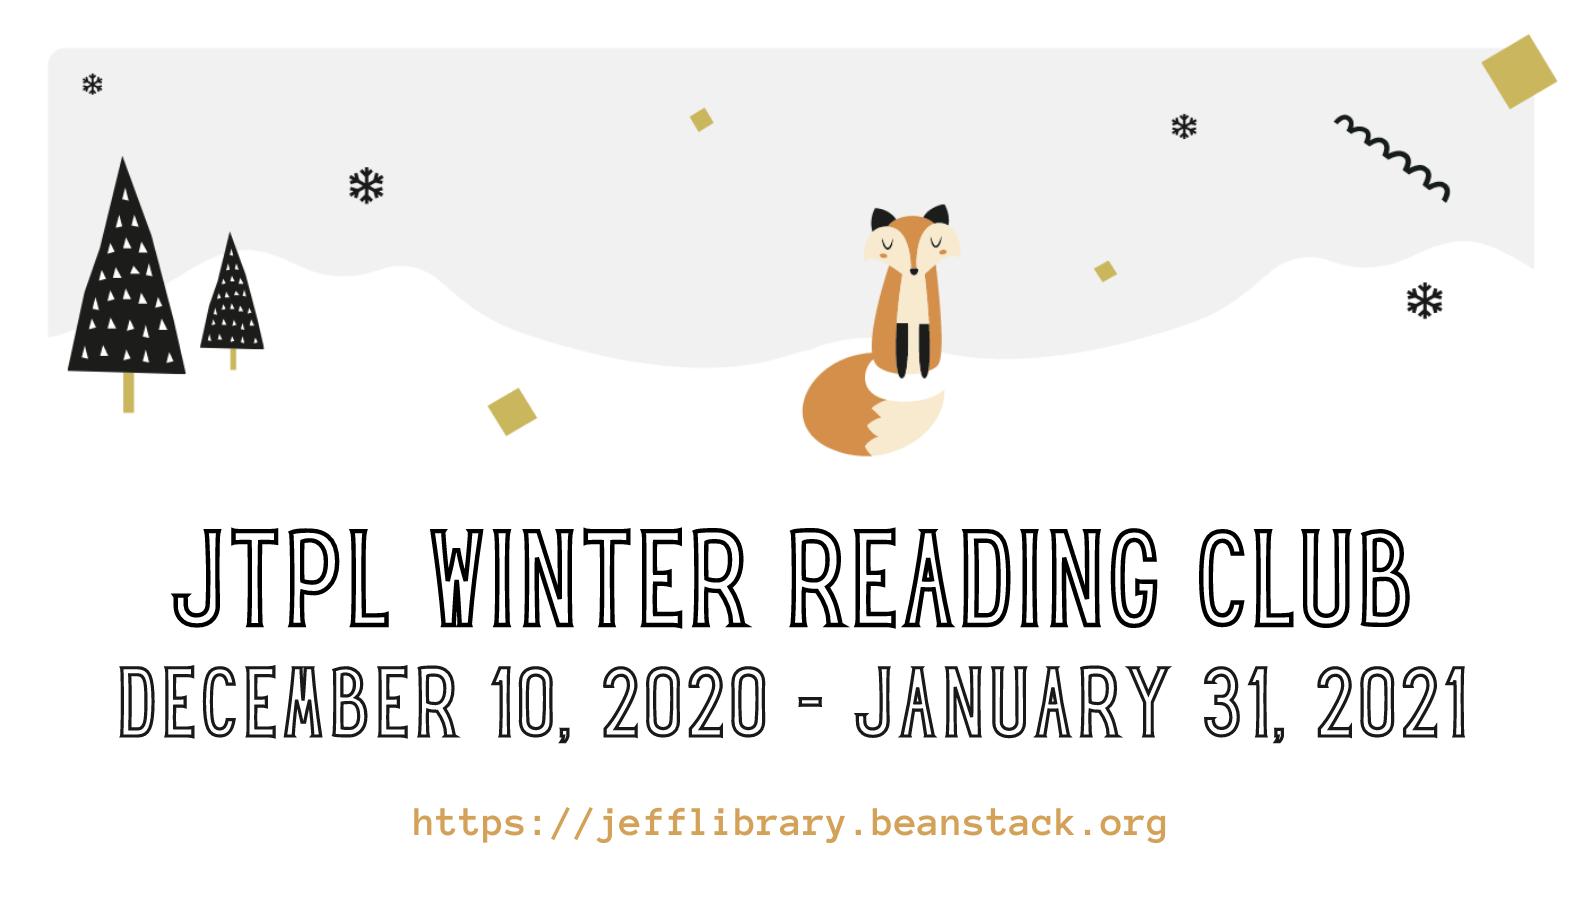 Winter Reading Club 2020-2021